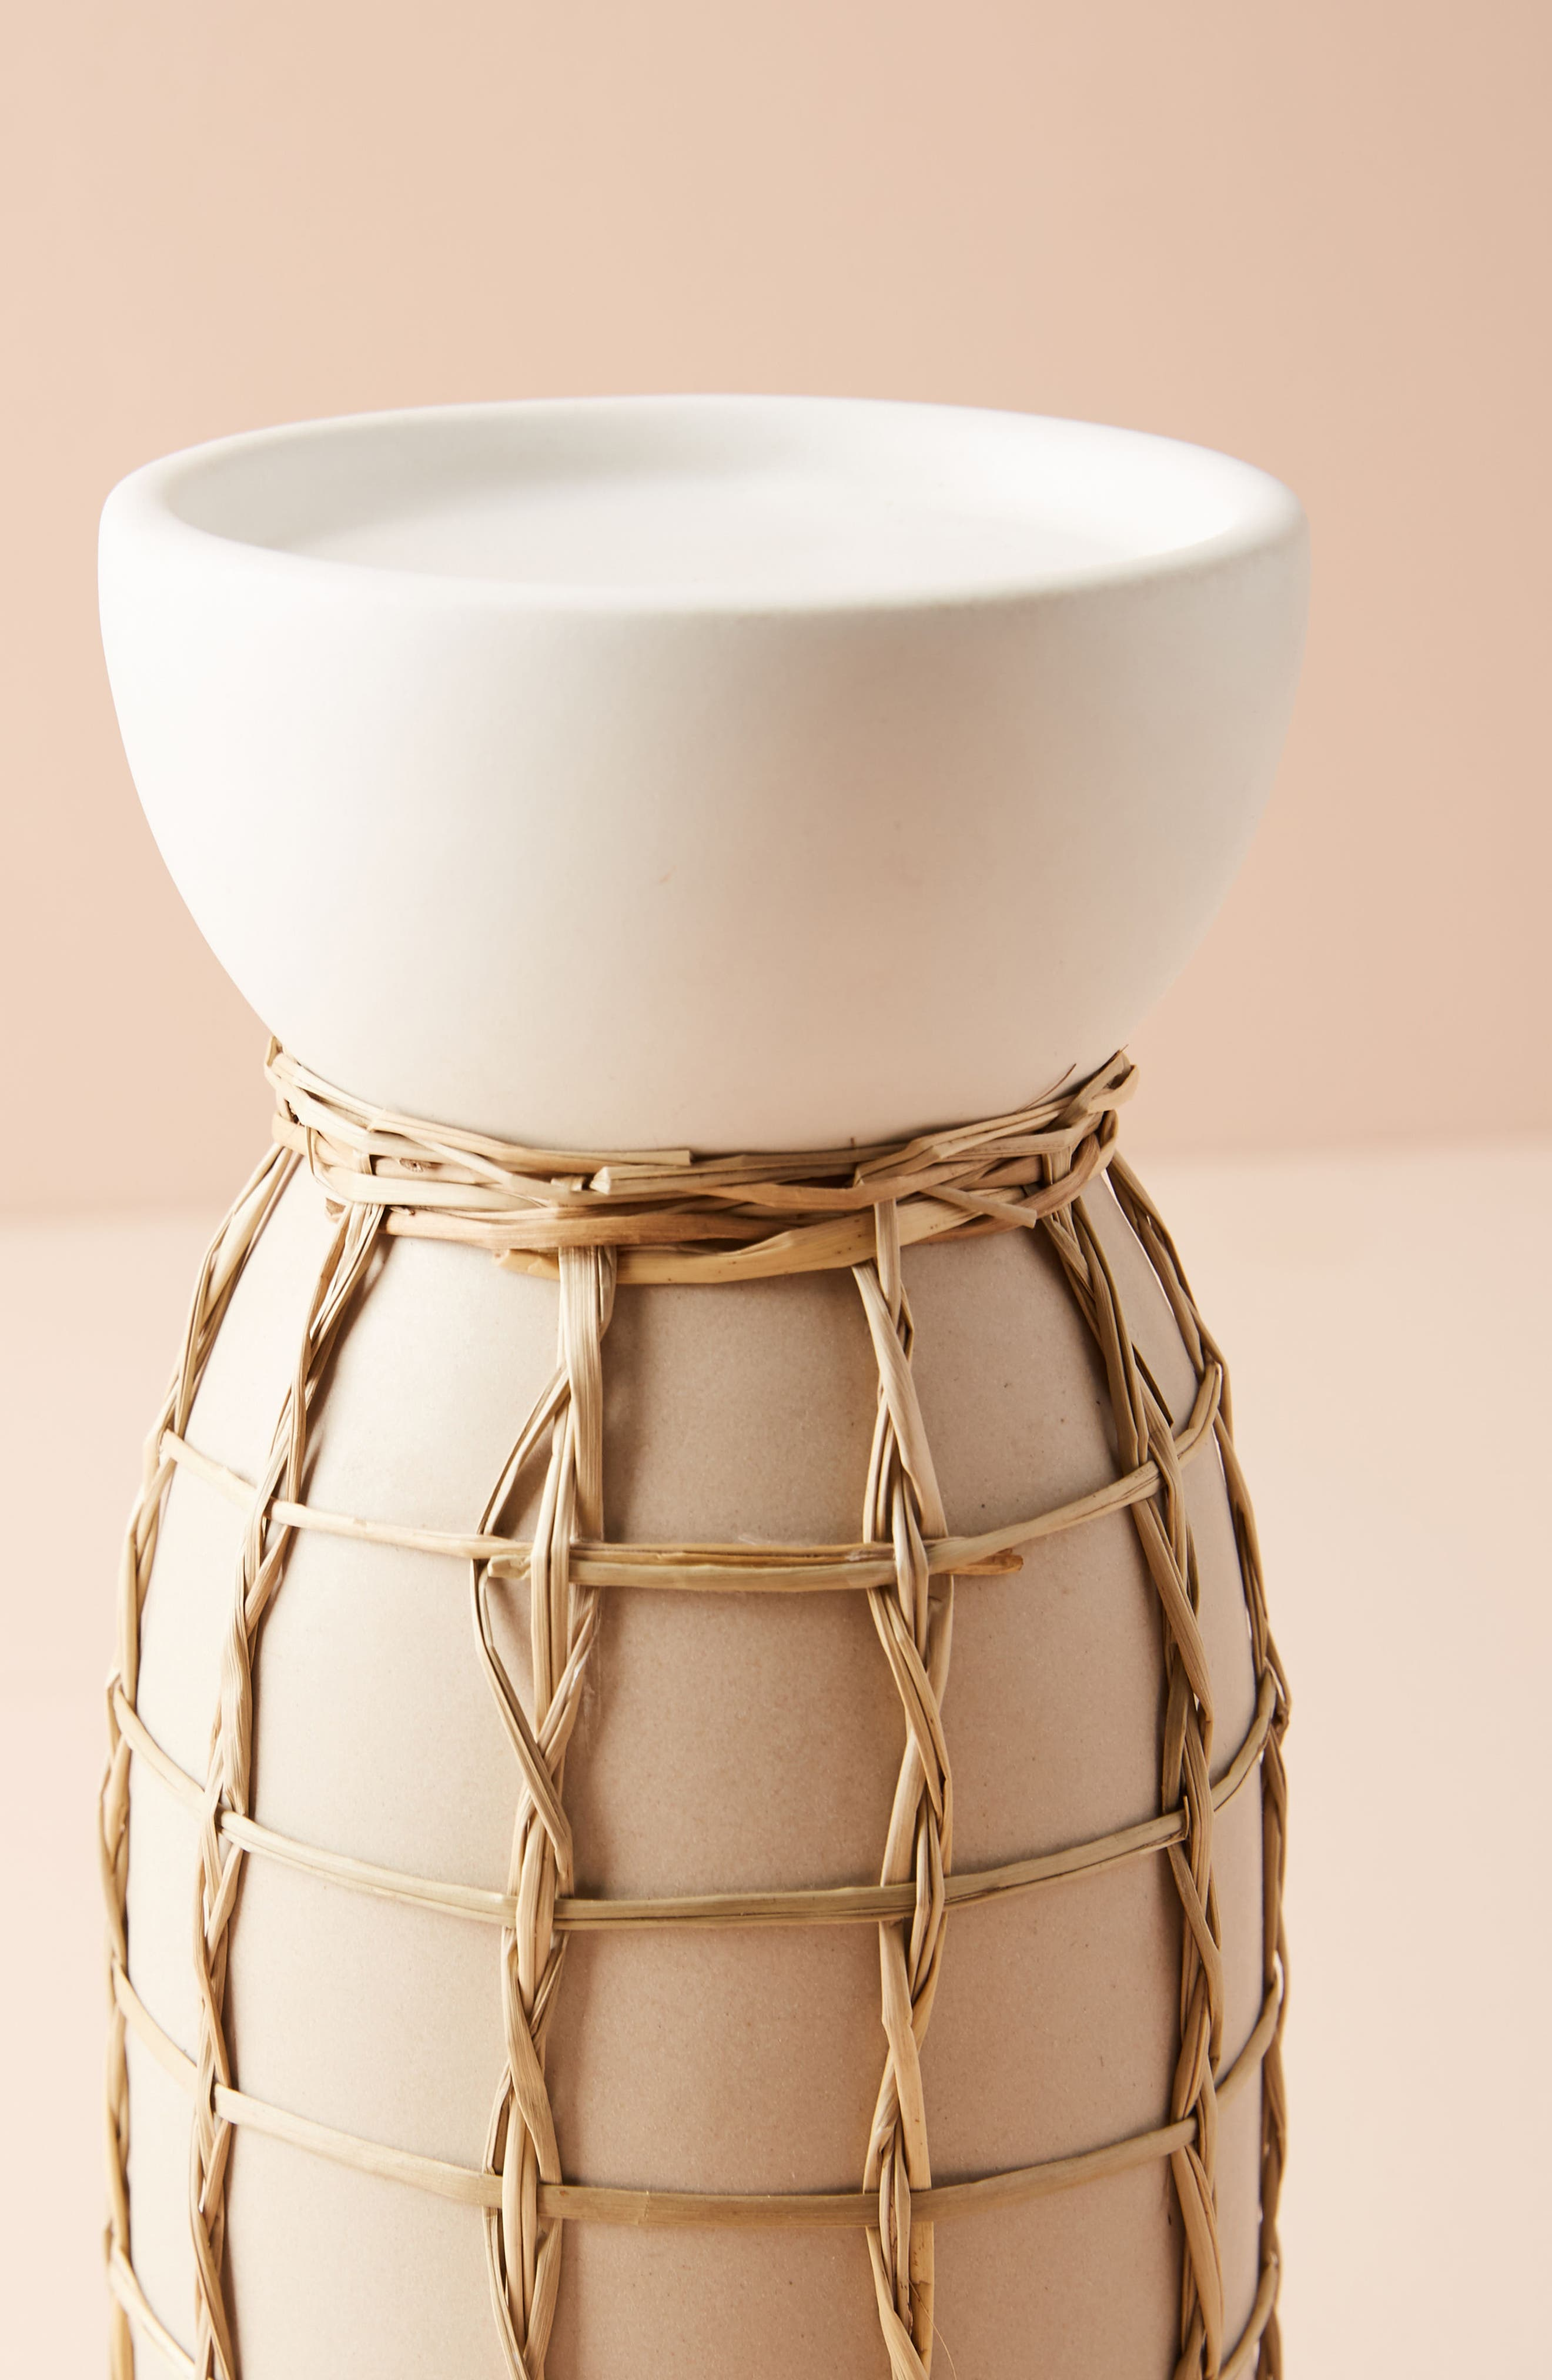 Wicker Pillar Candleholder,                             Alternate thumbnail 2, color,                             Cream - Large